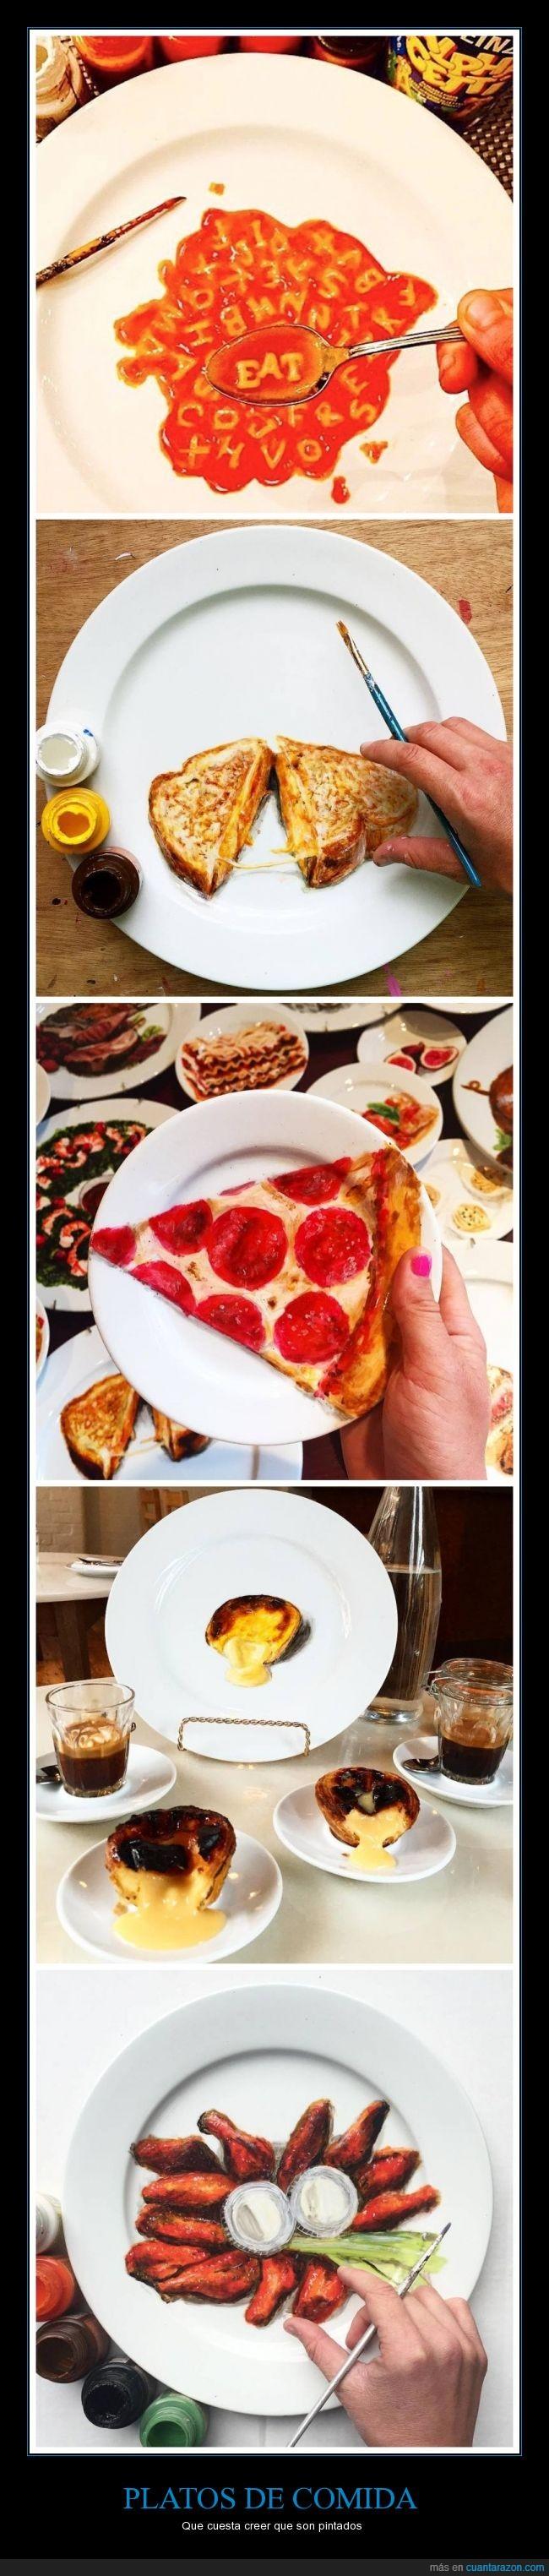 alitas,comida,hiperrealismo,hiperrealista,pintura,pizza